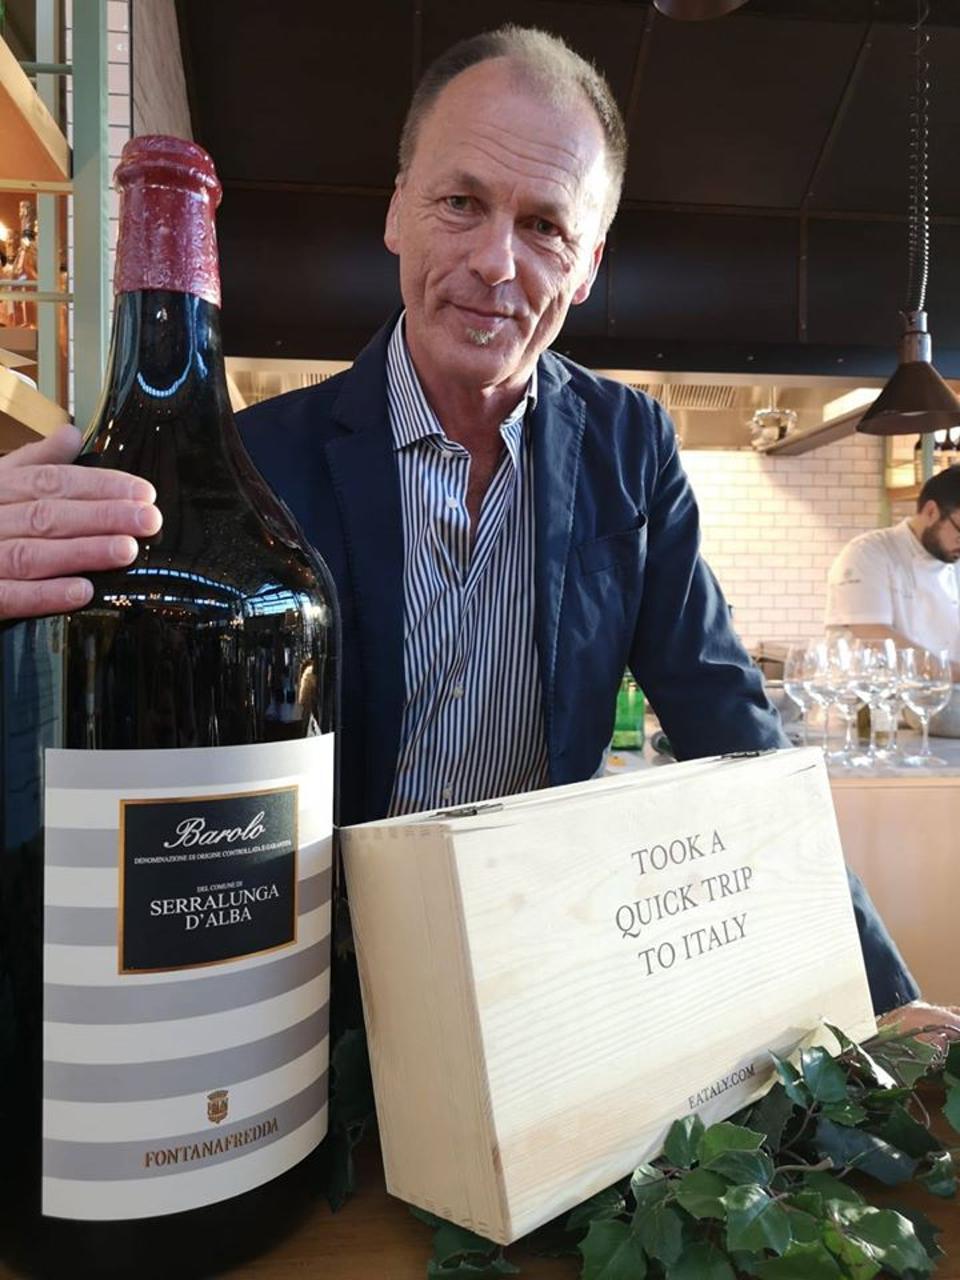 Giorgio Lavagna is the chief winemaker at Fontanafredda